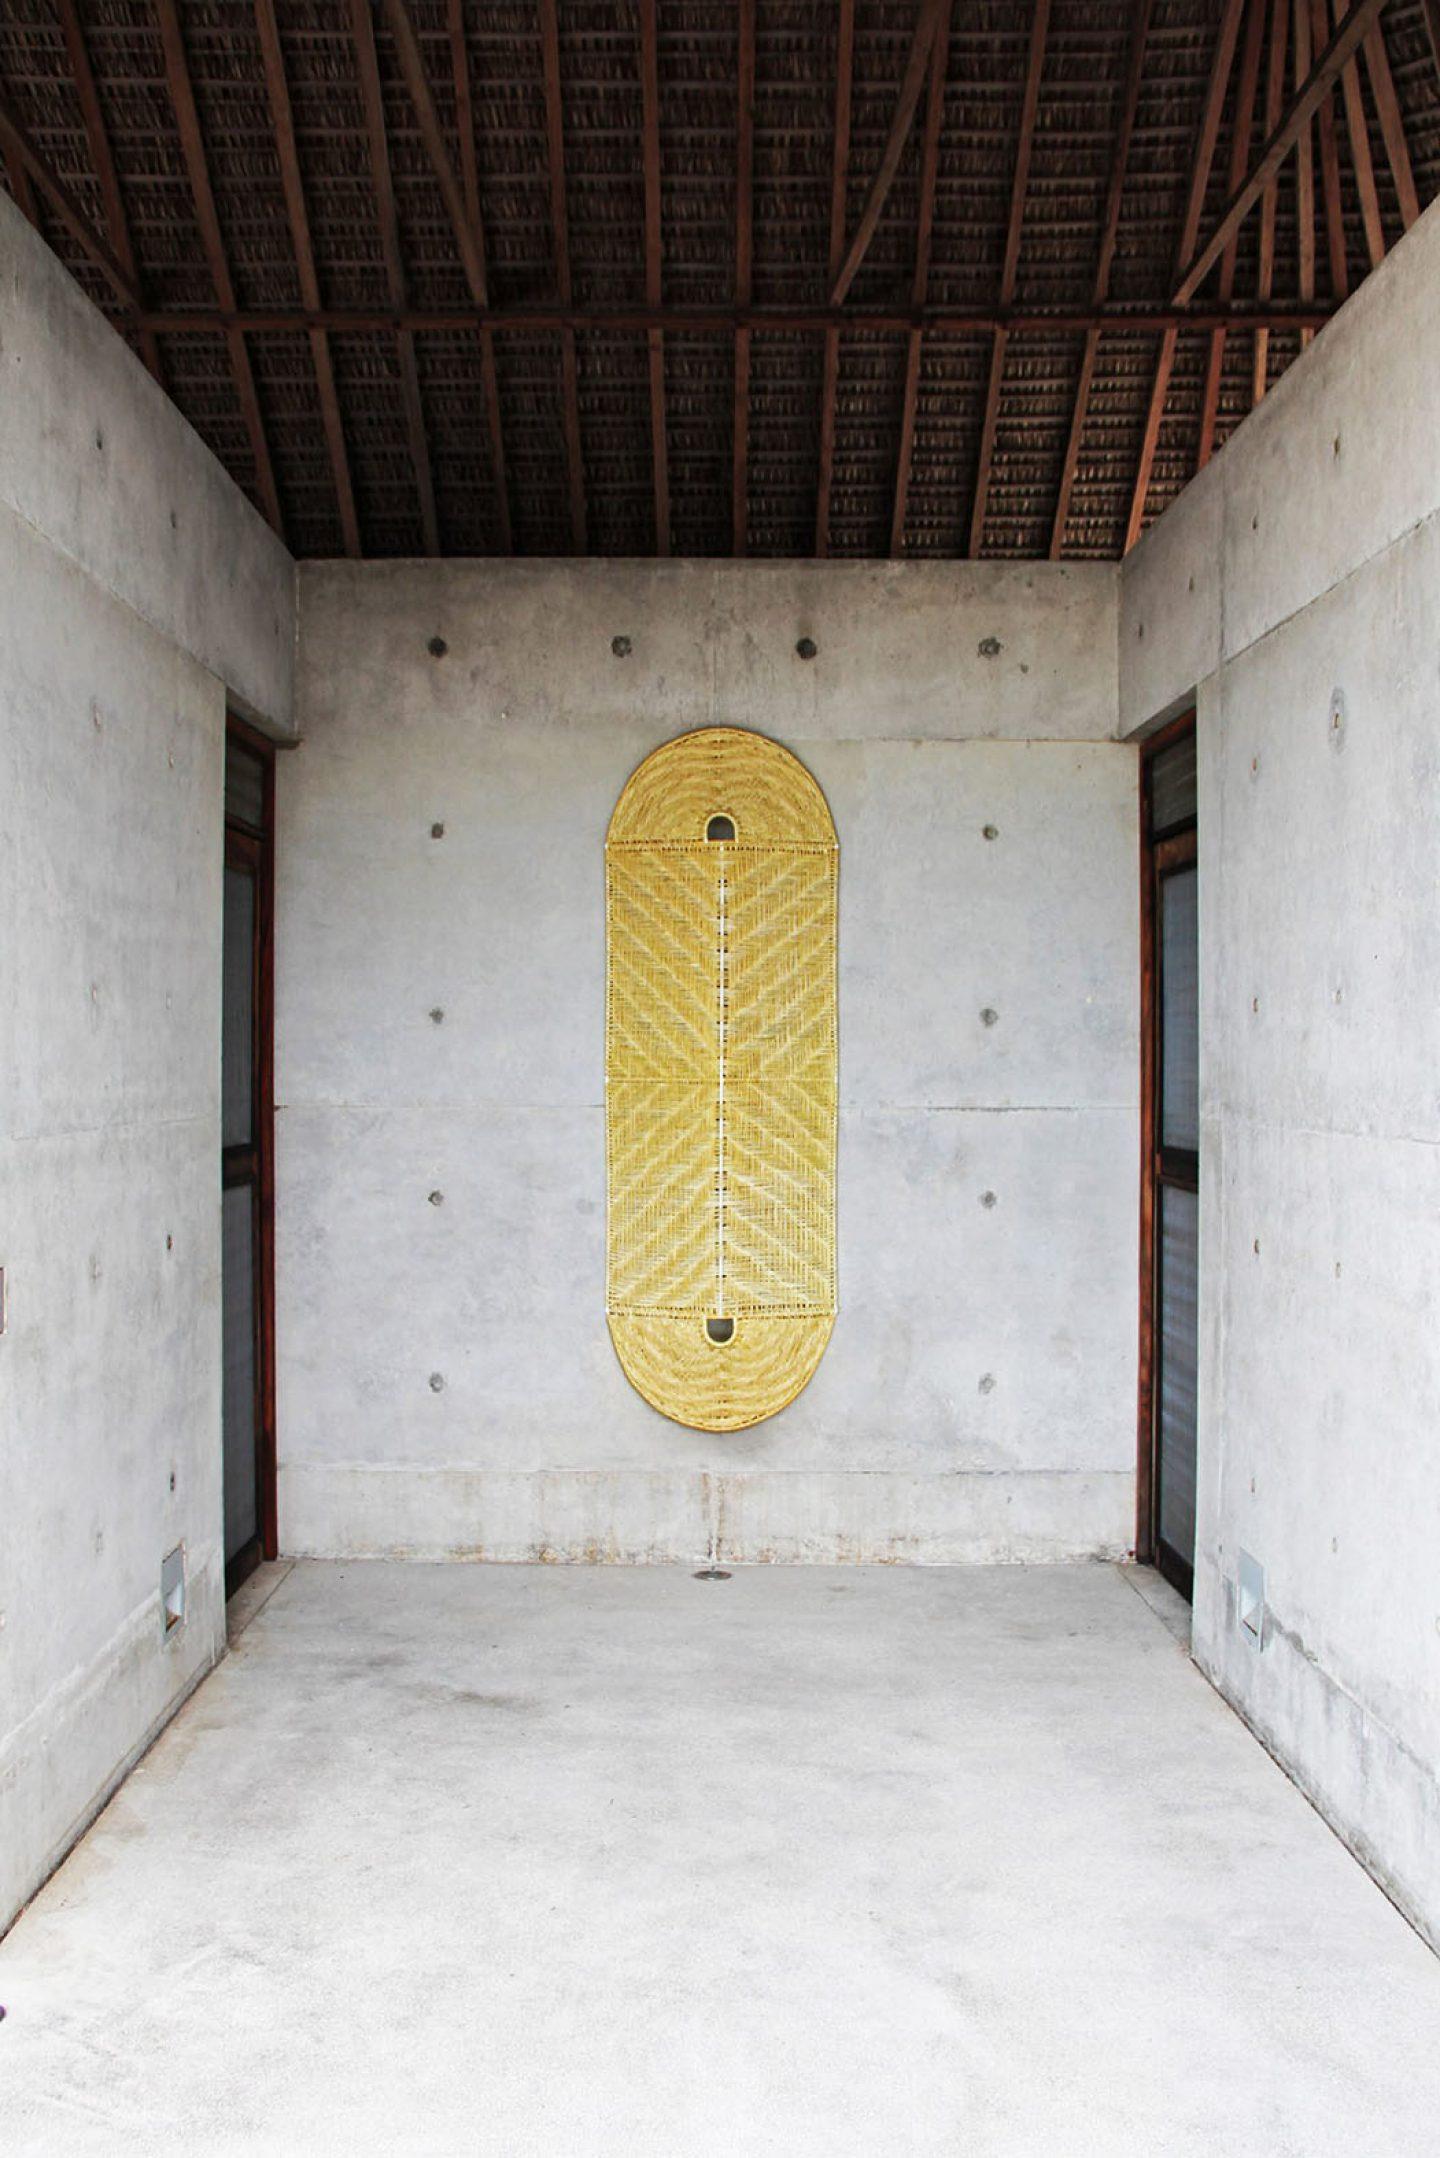 iGNANT-Design-Julie-Richoz-Nicolas-Le-Moigne-Woven-Screens-Lights-7